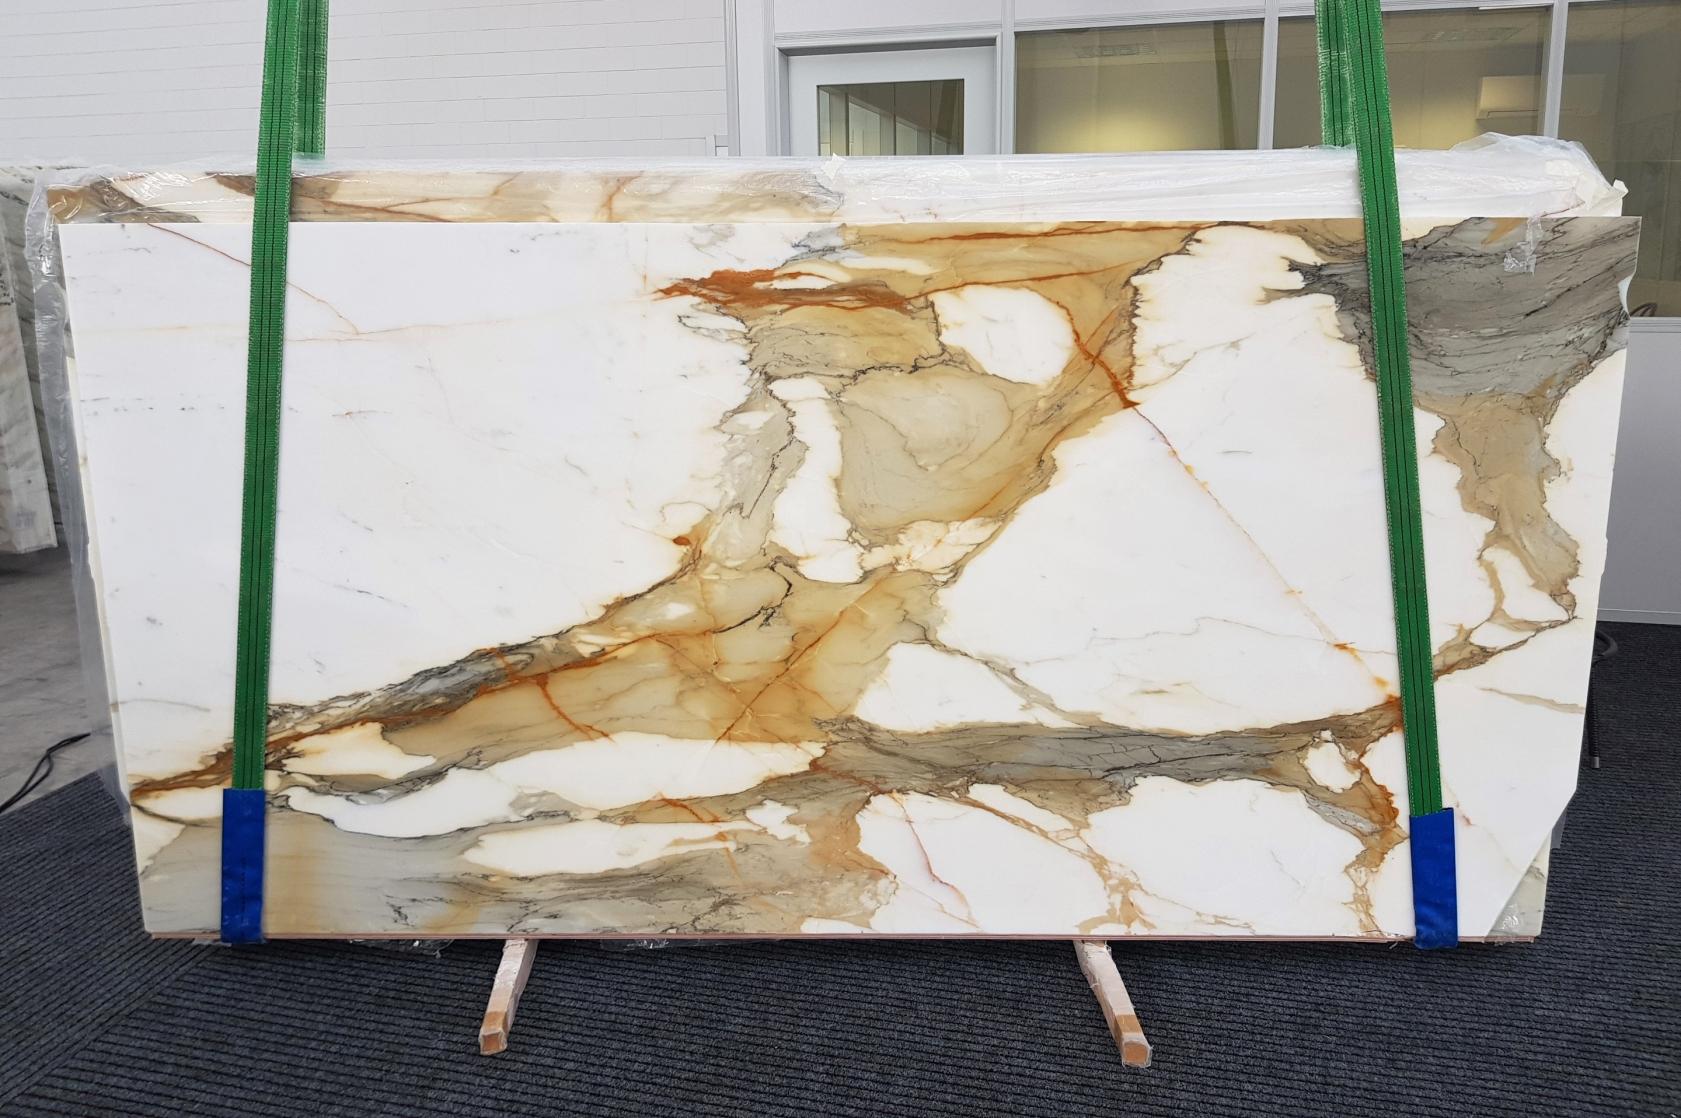 CALACATTA MACCHIAVECCHIA Suministro Verona (Italia) de planchas pulidas en mármol natural GL 1130 , Bundle #7